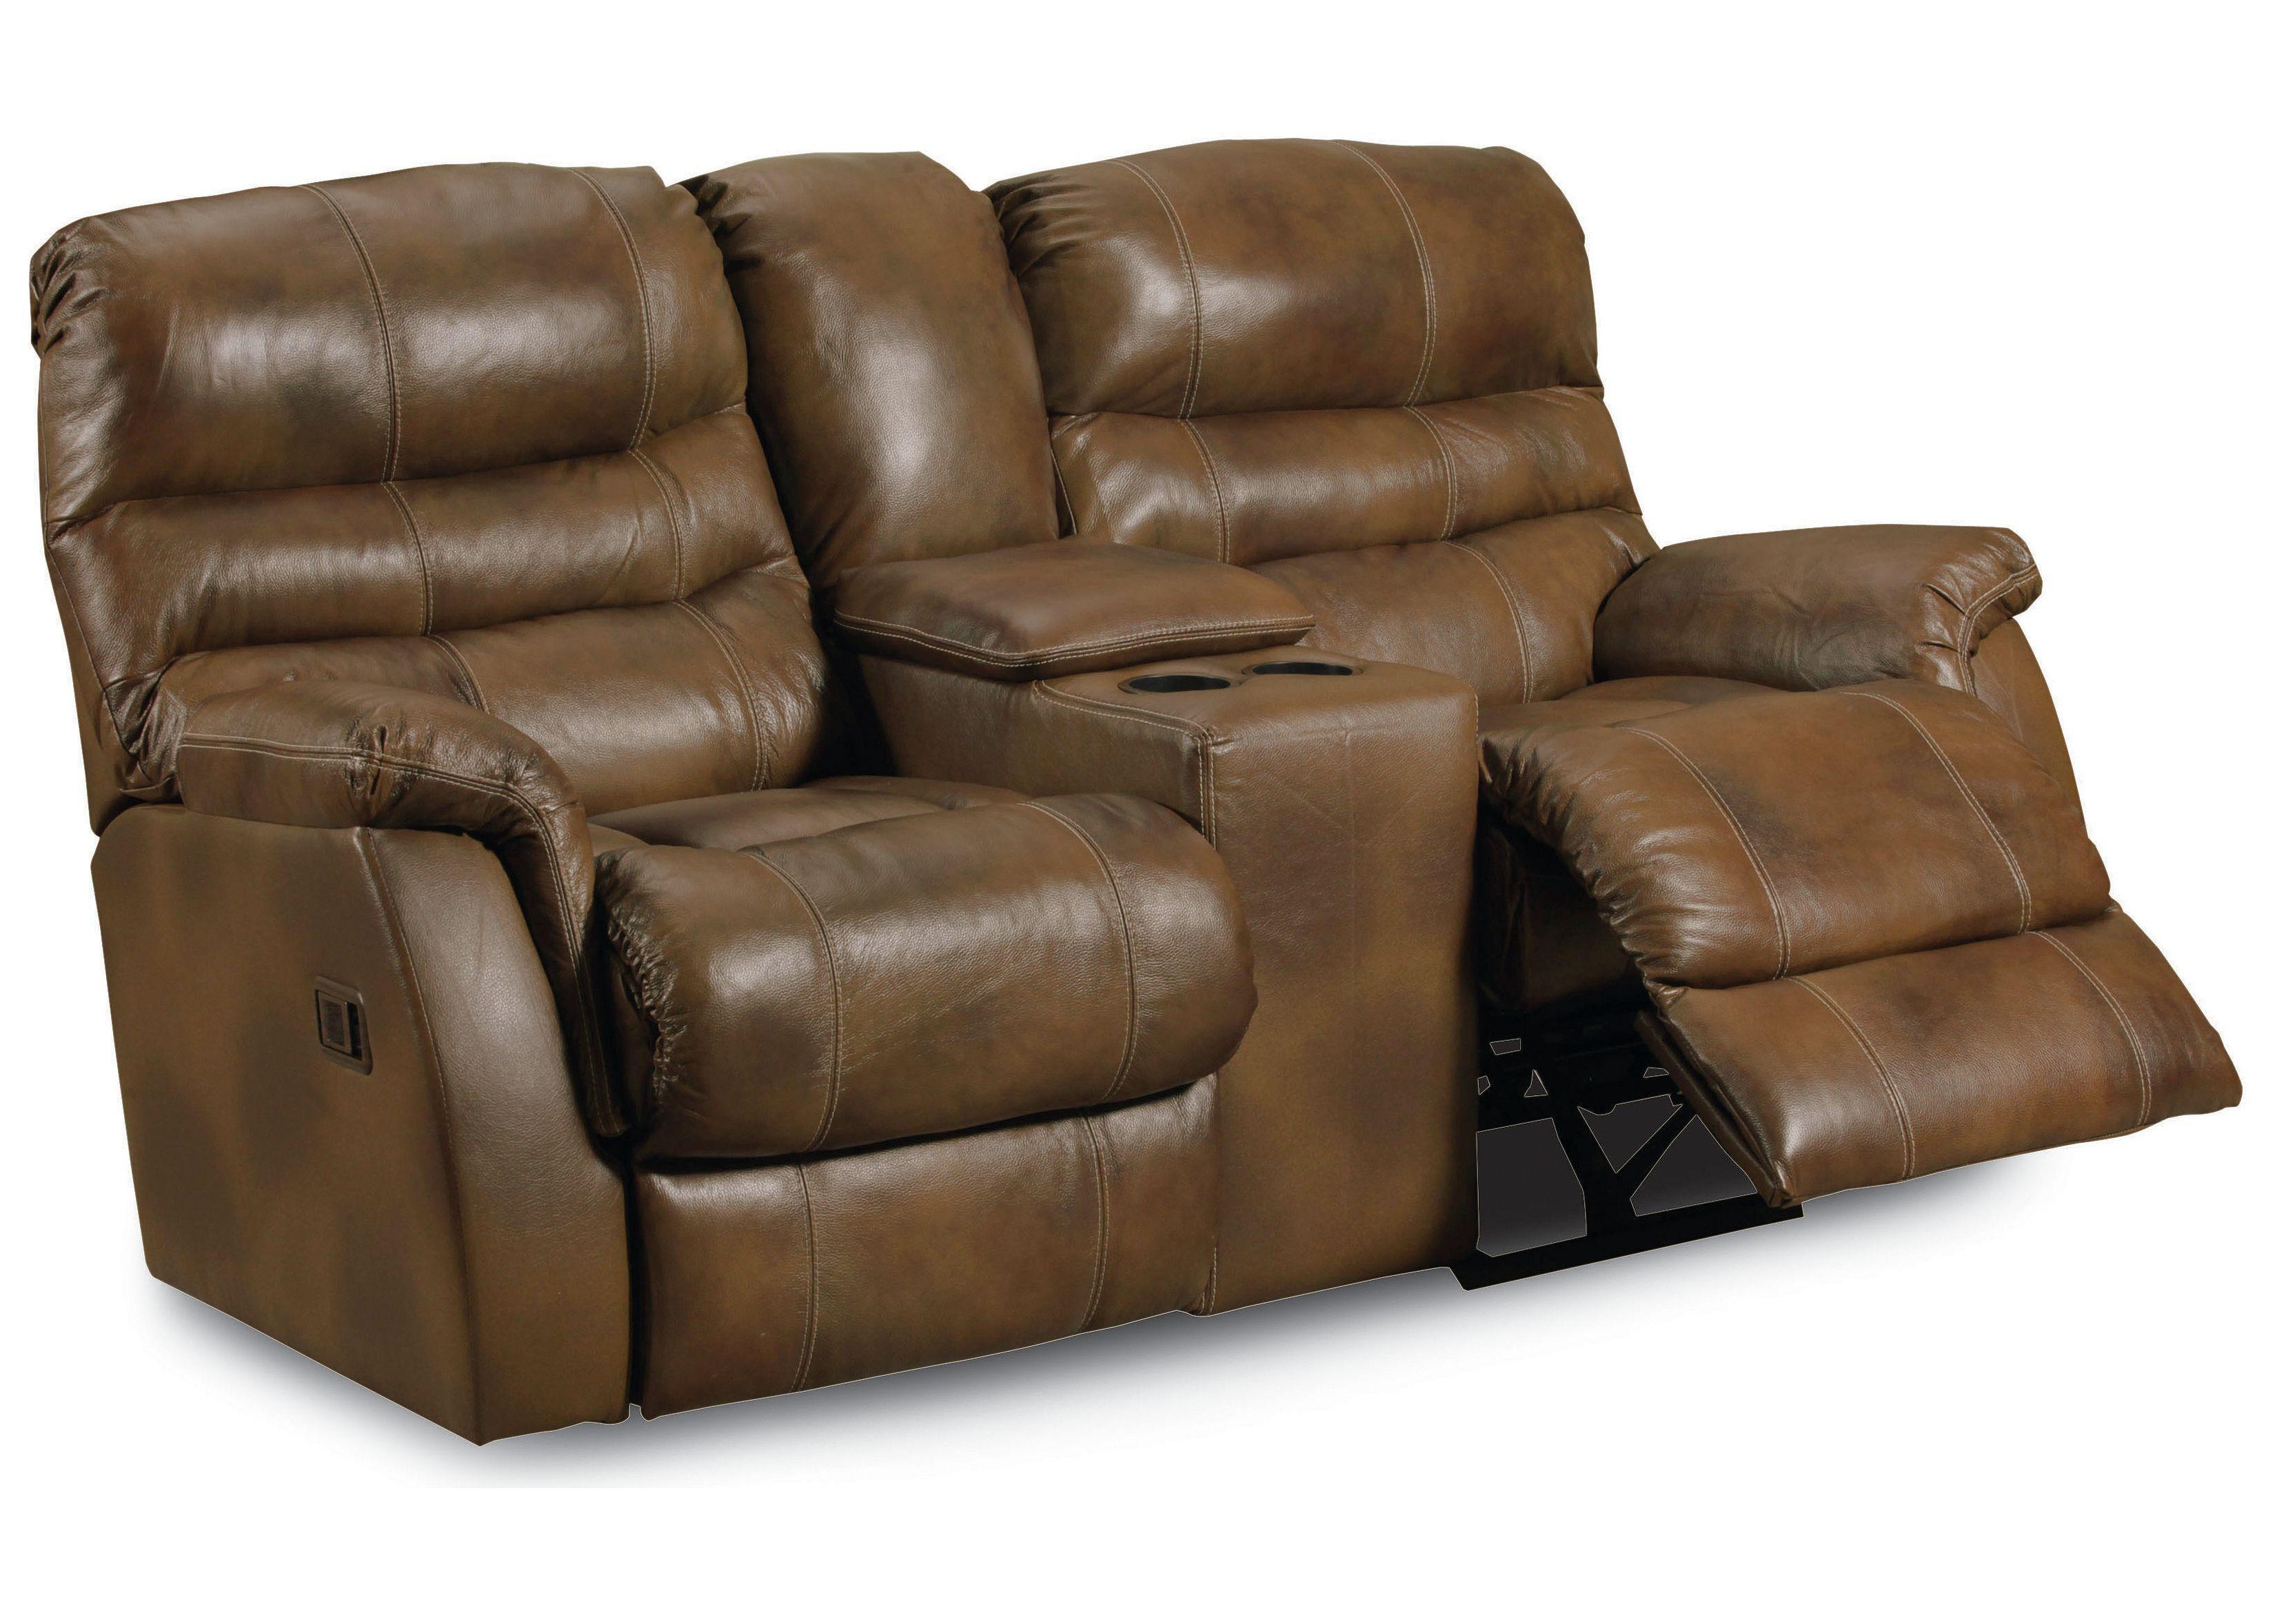 lane triple reclining sofa 45 degree angled sectional garrett 328 43 casual double